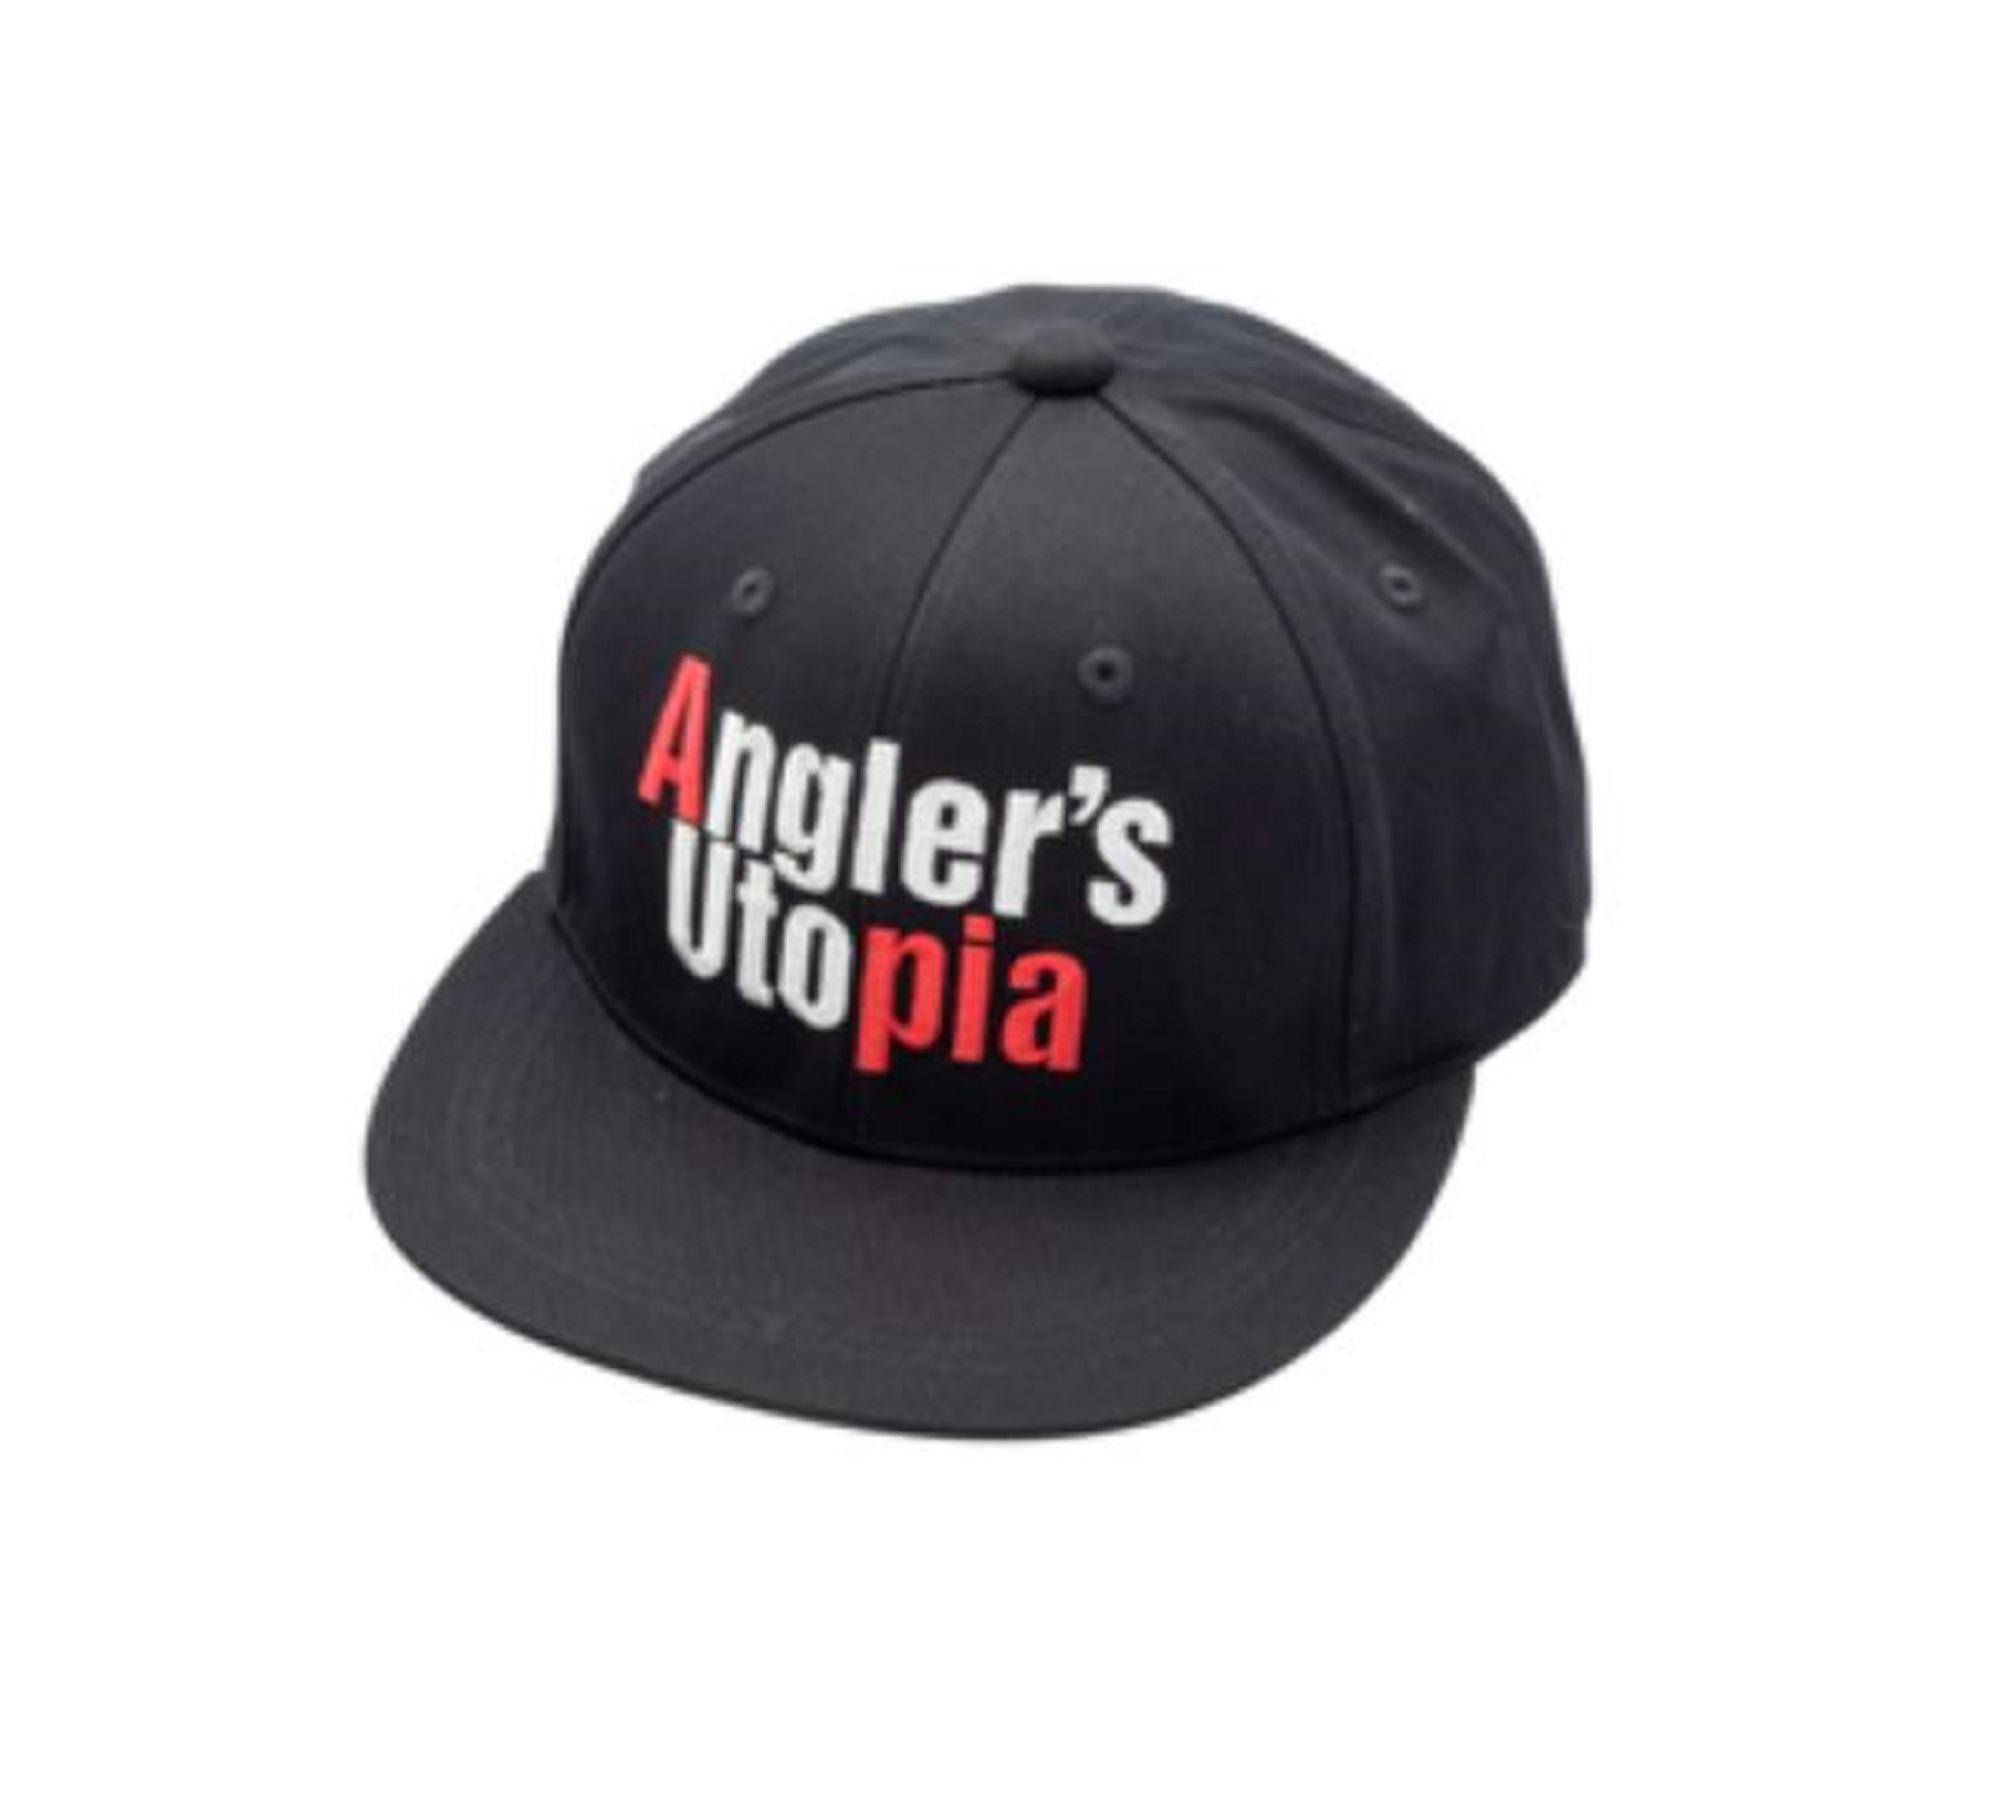 Apia Cap Flat Cap Free Size Black (0665)